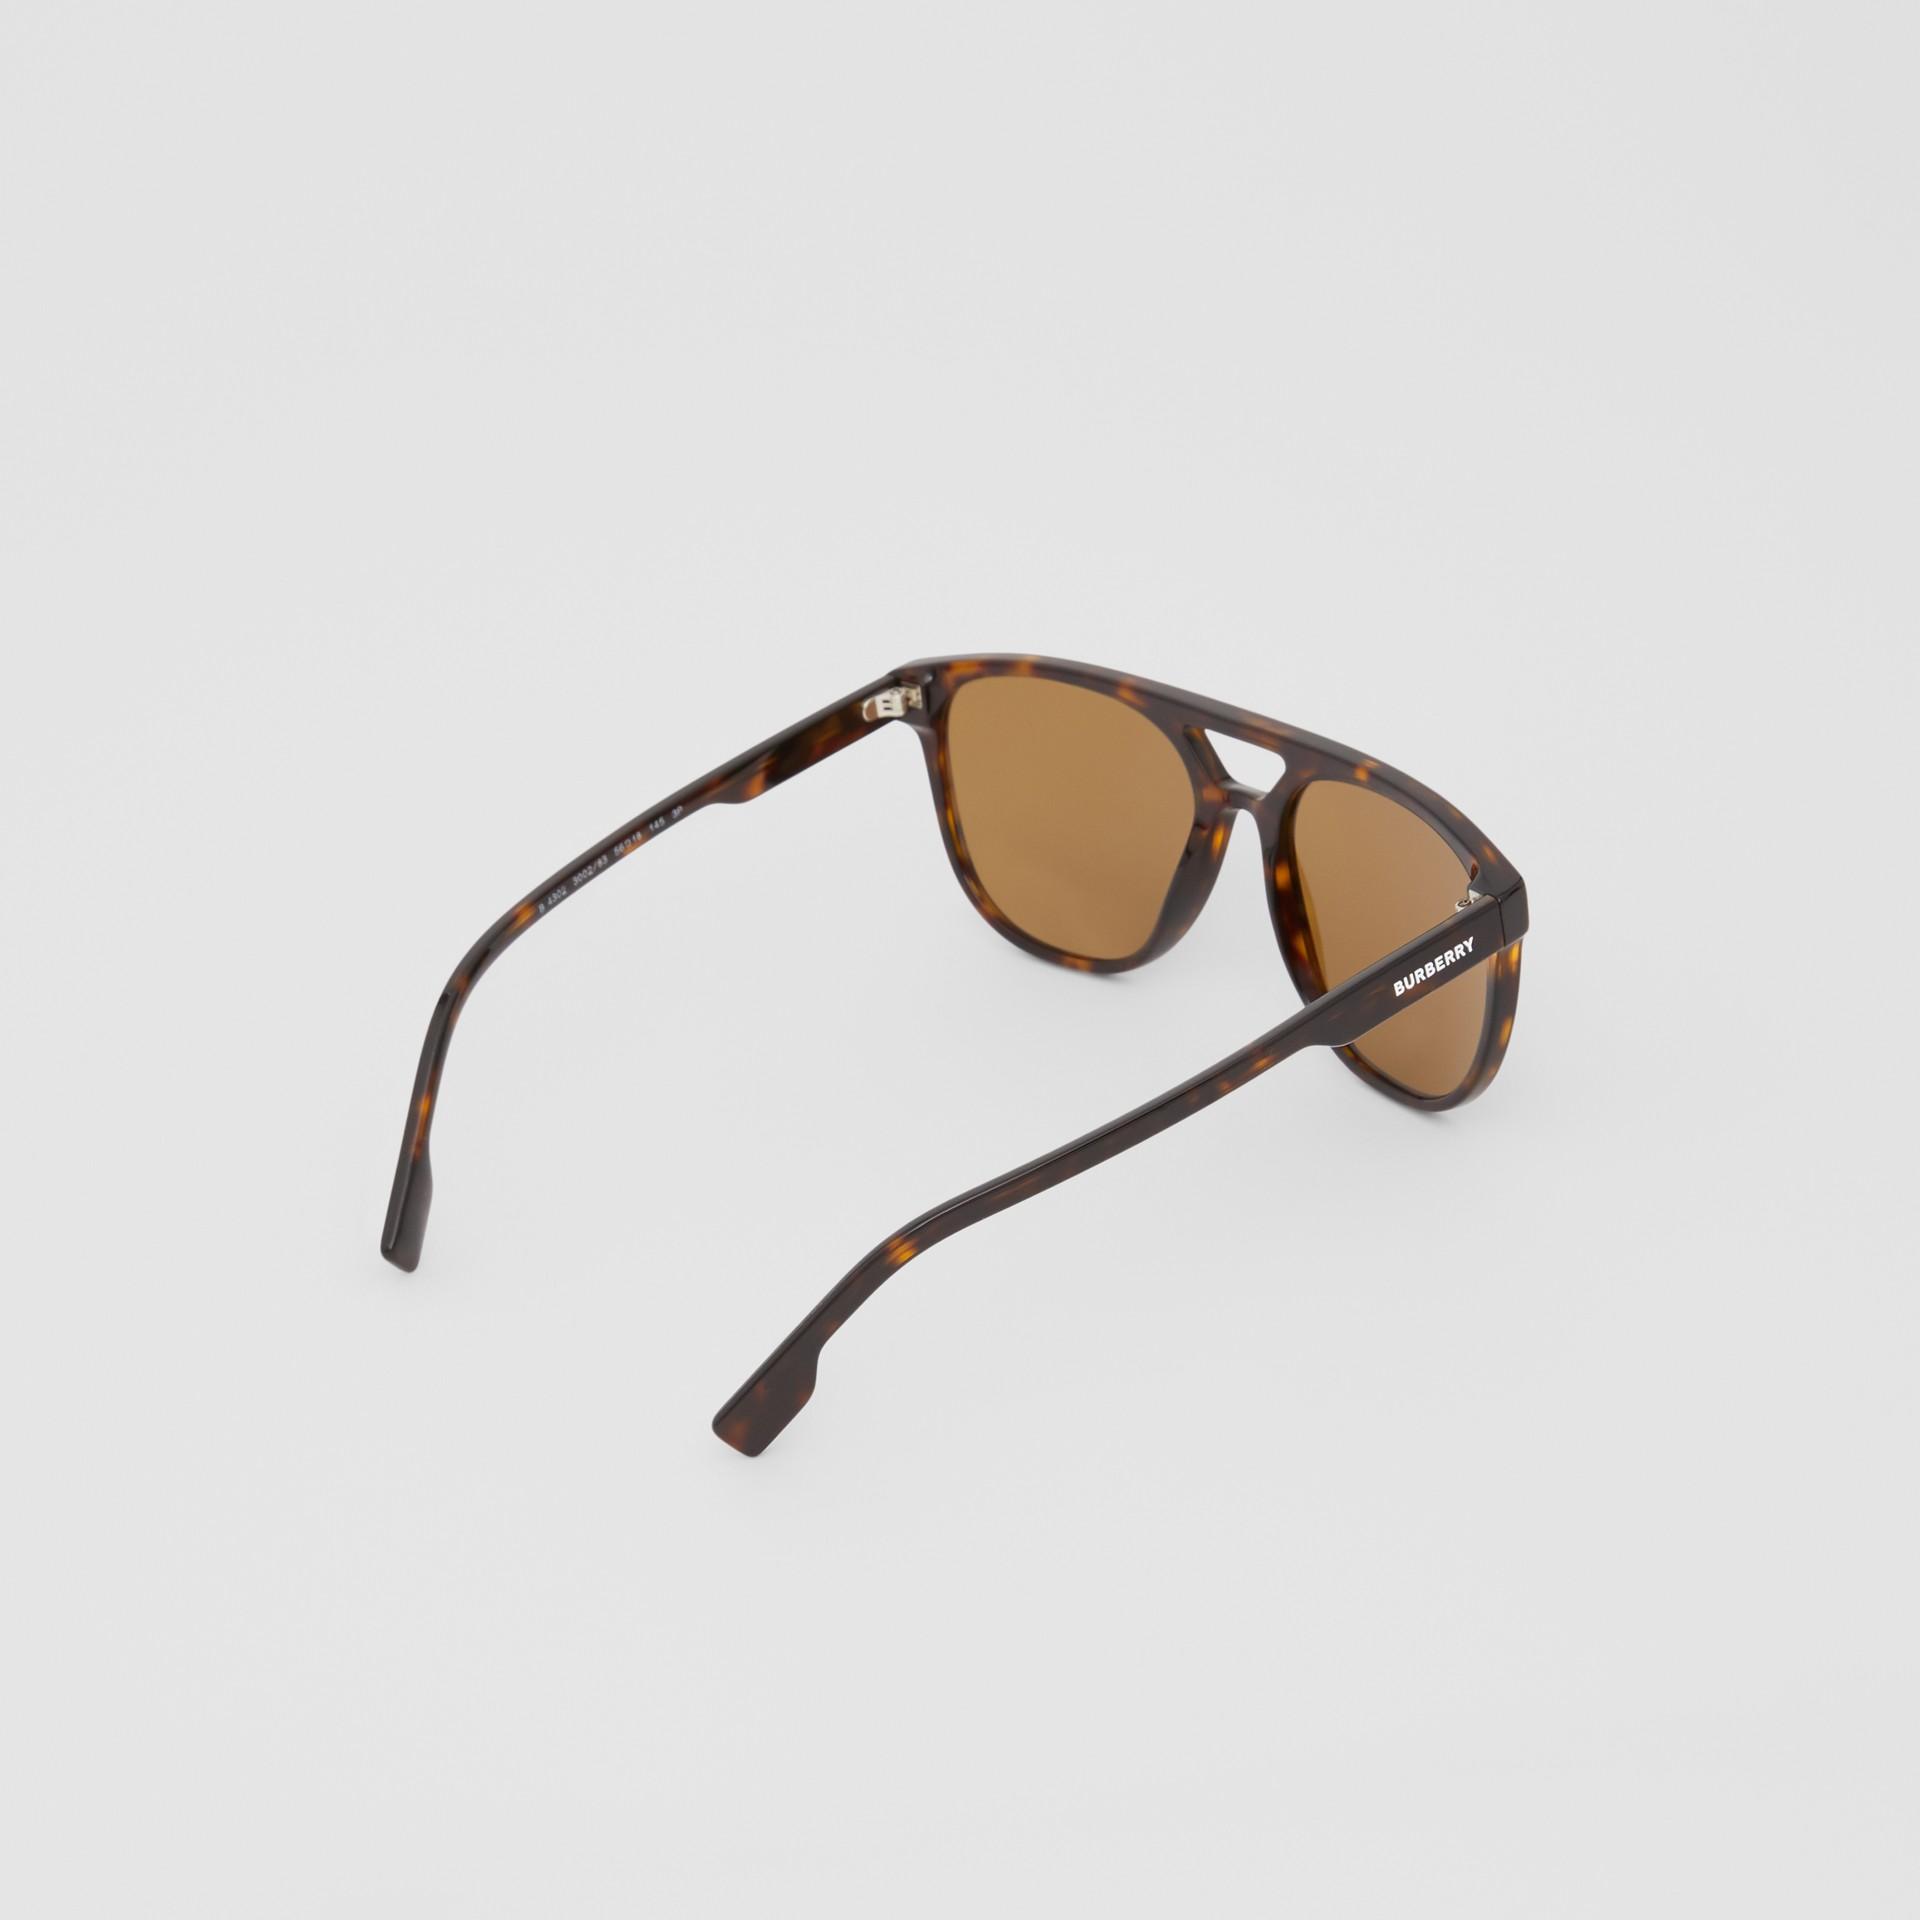 Navigator Sunglasses in Tortoiseshell - Men | Burberry - gallery image 4